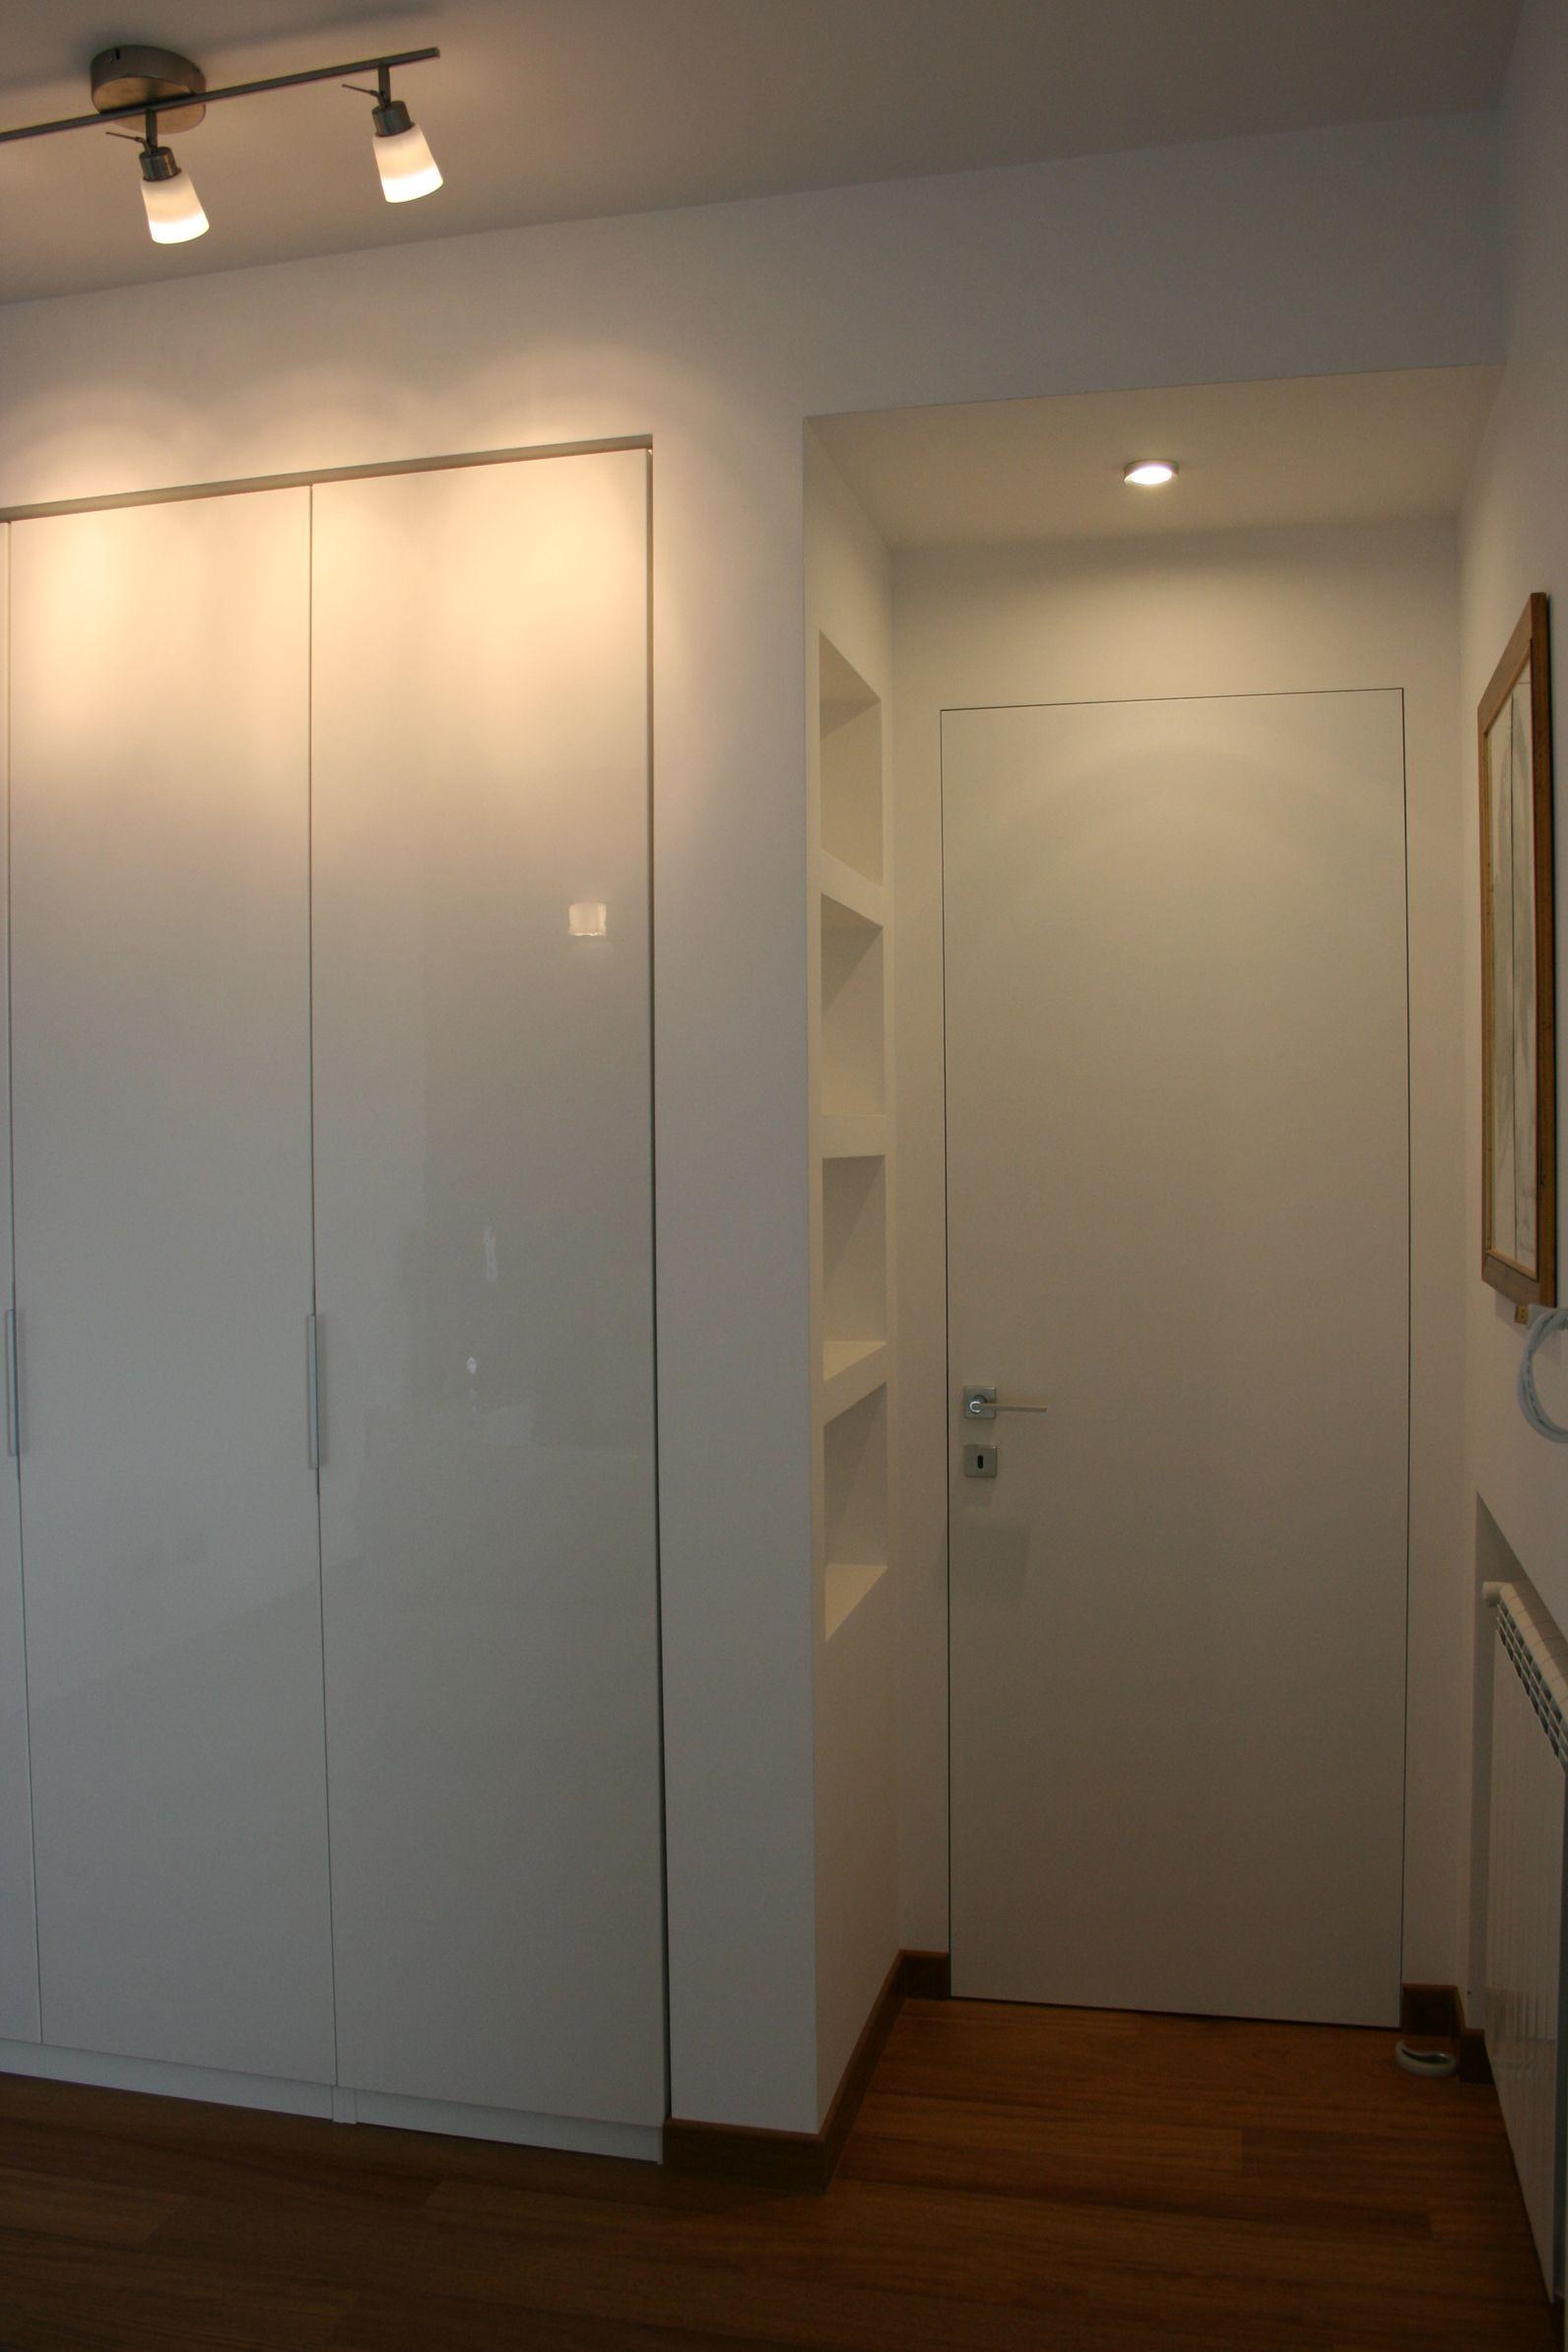 Case Cabina Armadio Cartongesso.Ingresso Ingresso Nel 2019 Bedroom Cupboards Closet Bedroom E